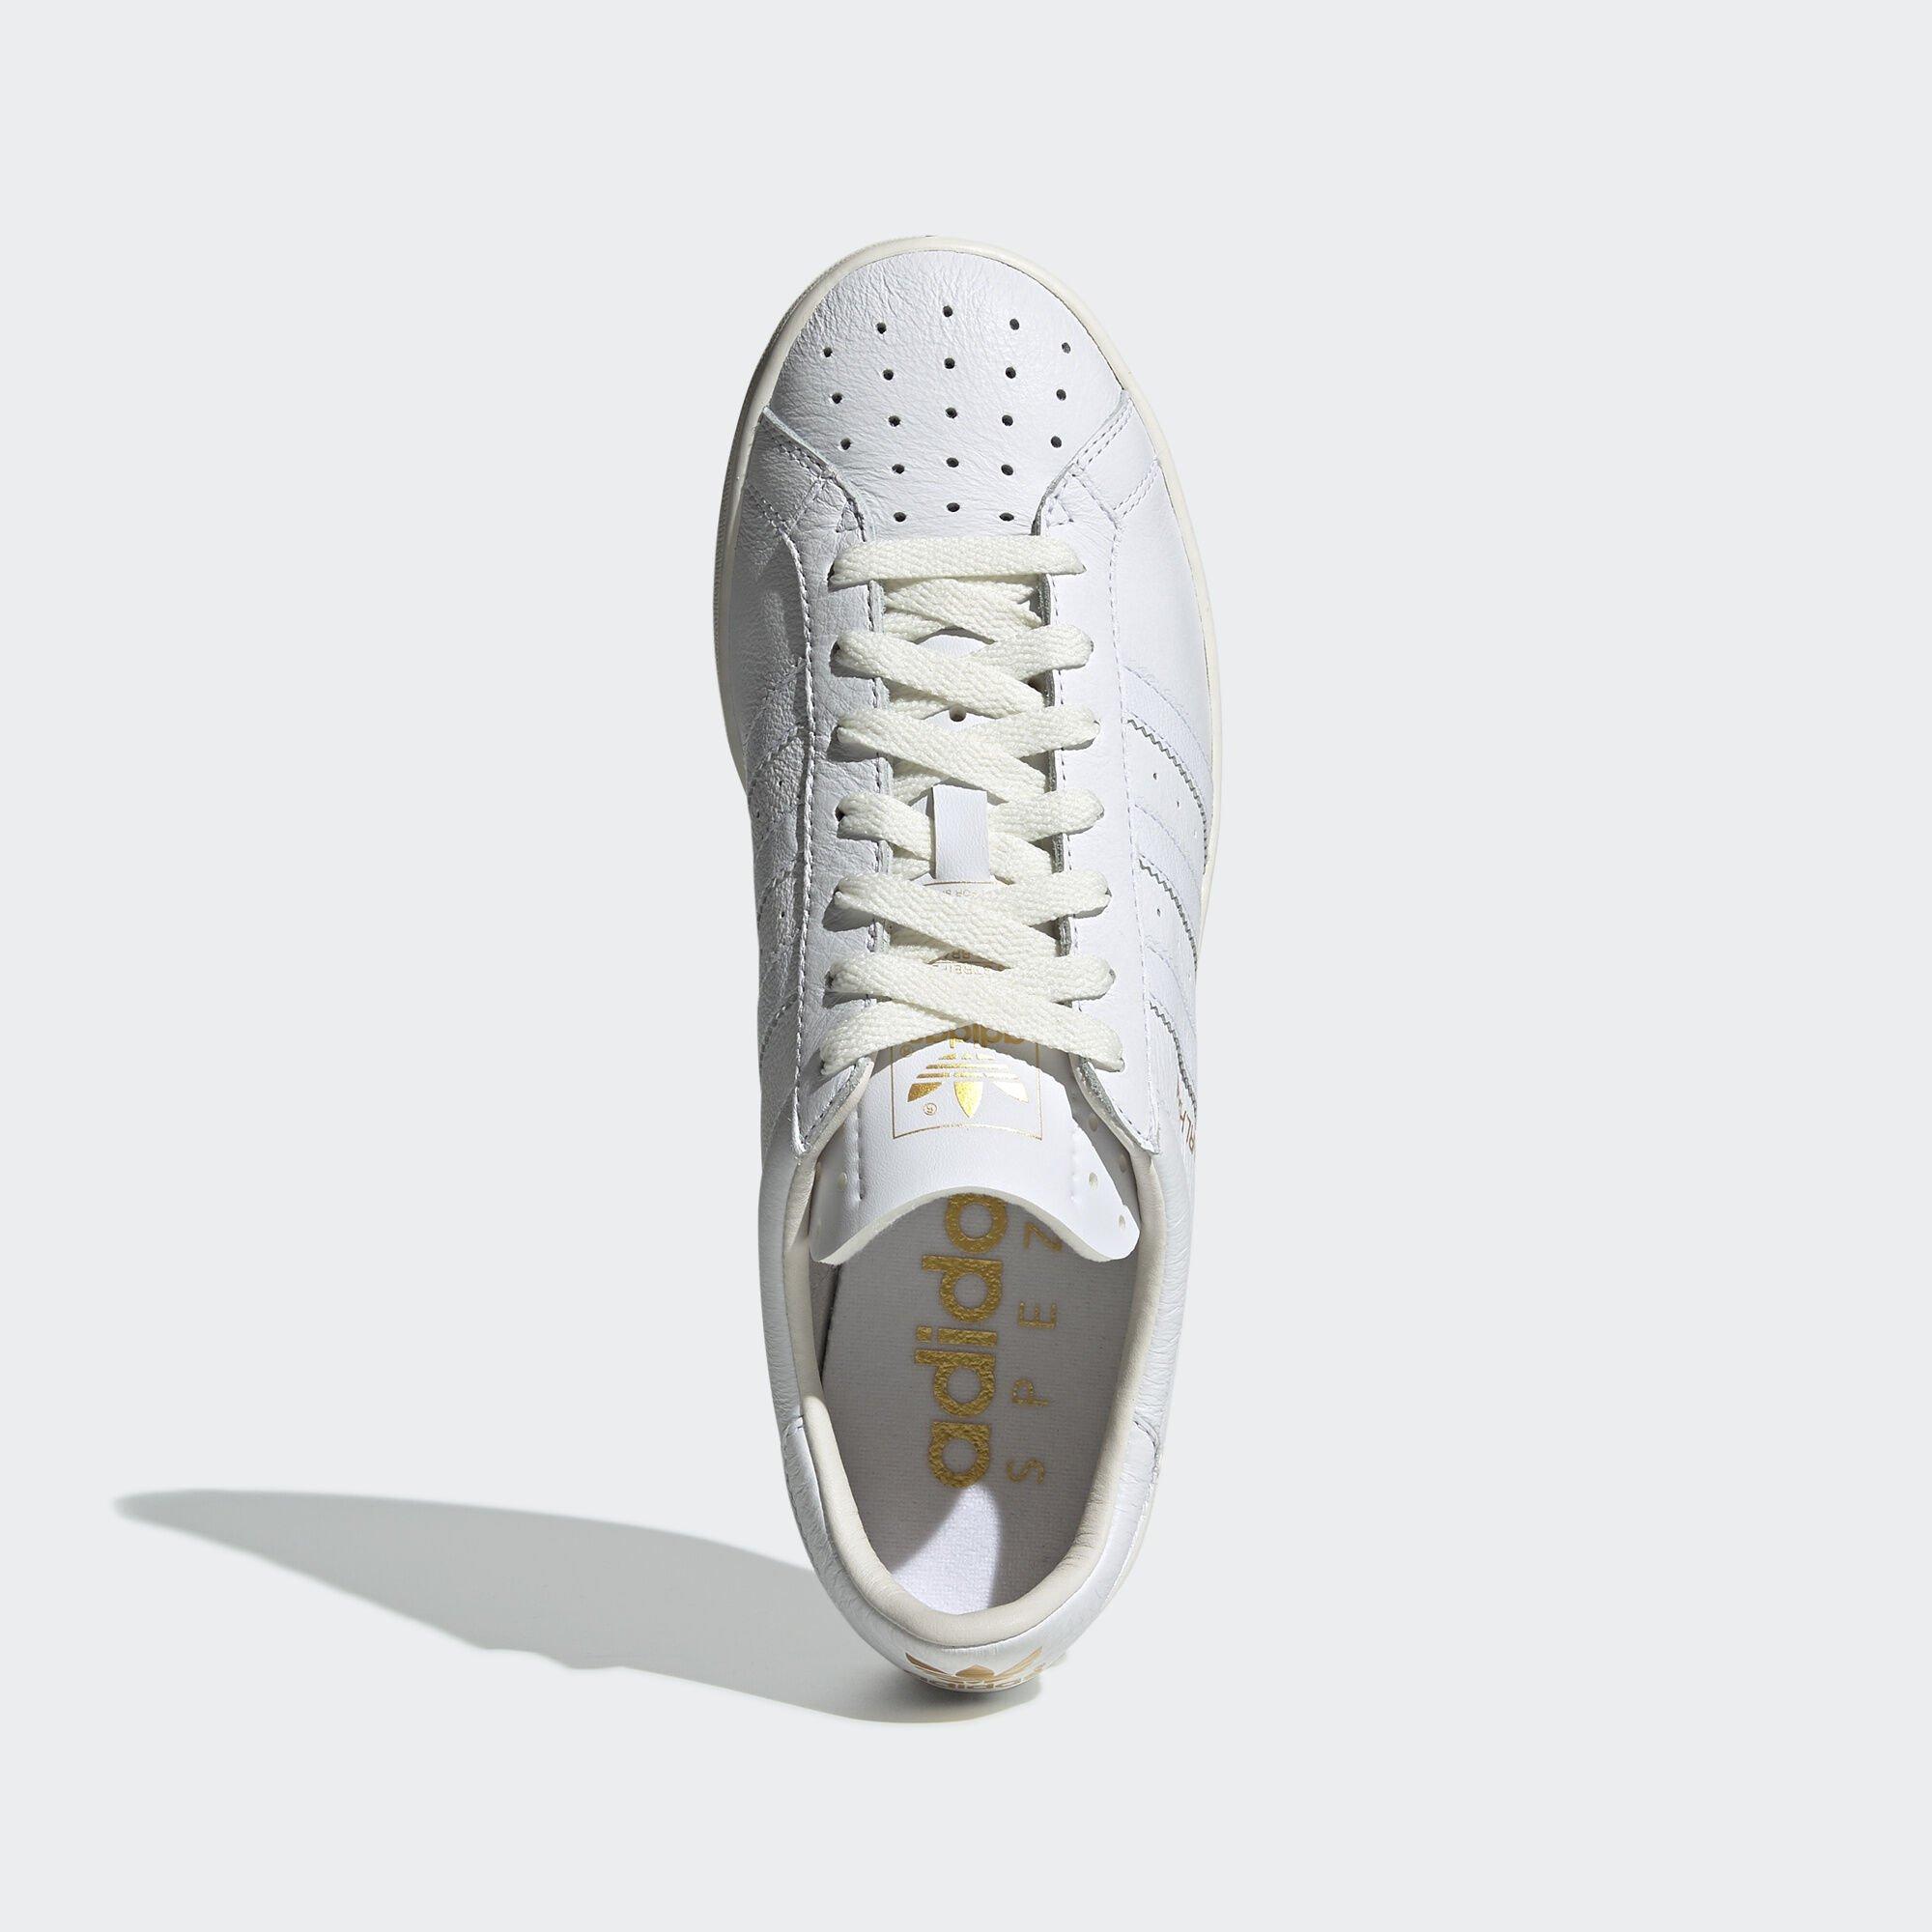 adidas Earlham Spzl Off White (F99866)